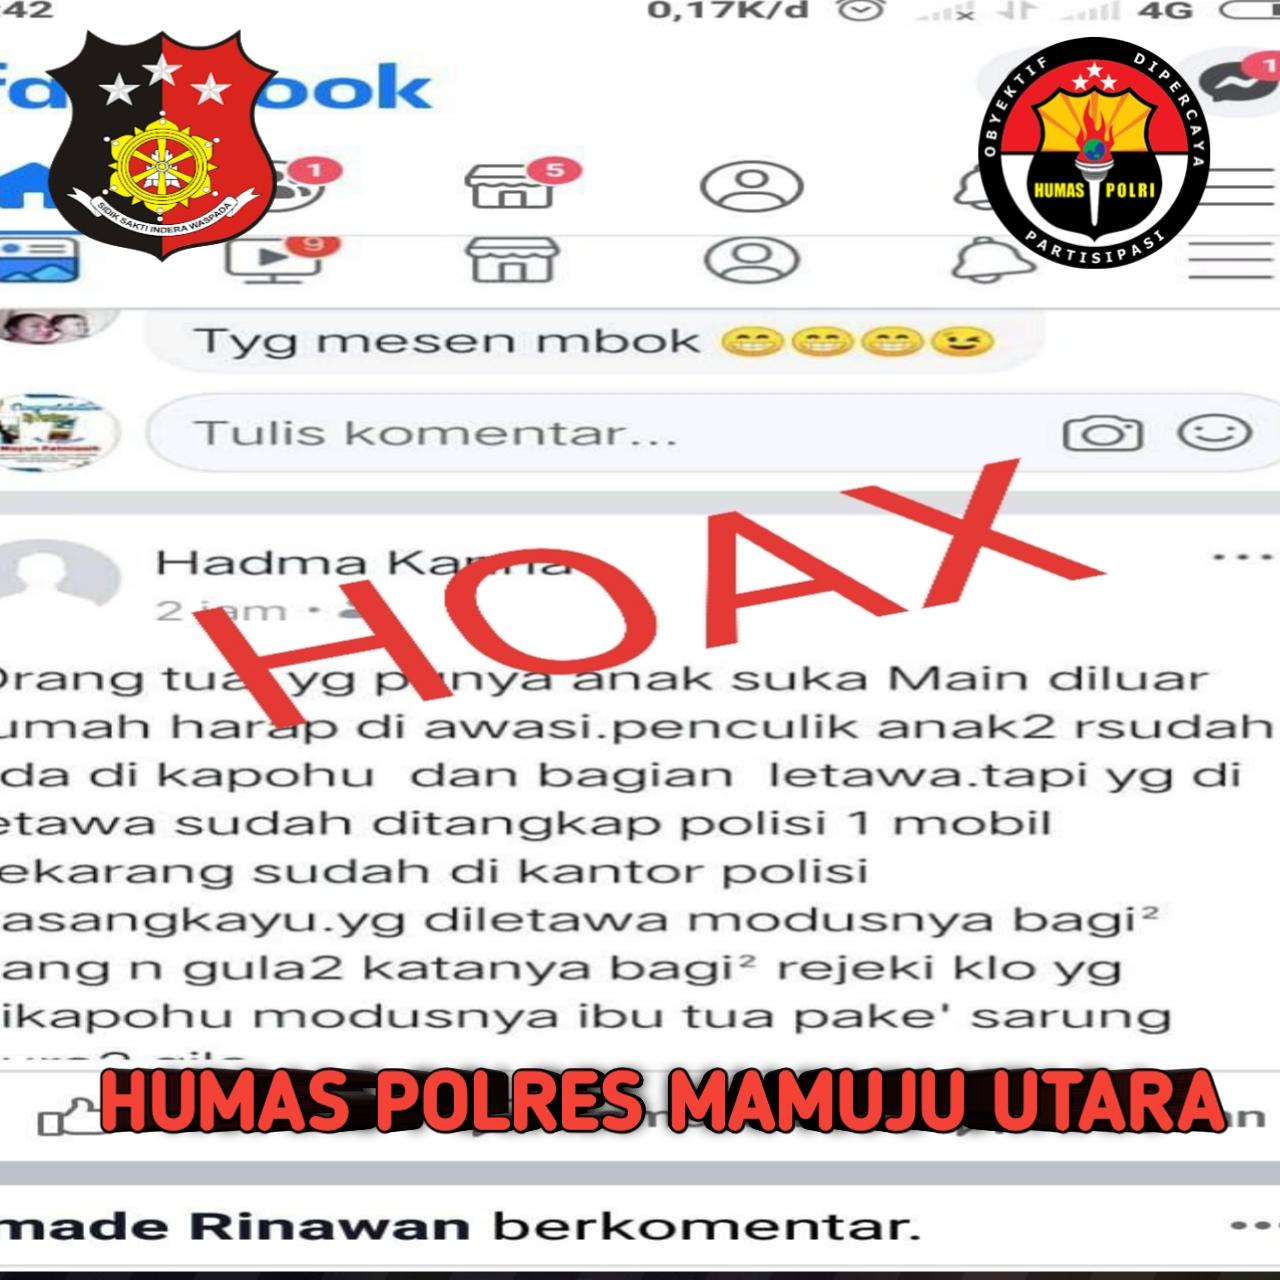 Isu Penculikan di Pasangkayu  Hoax!